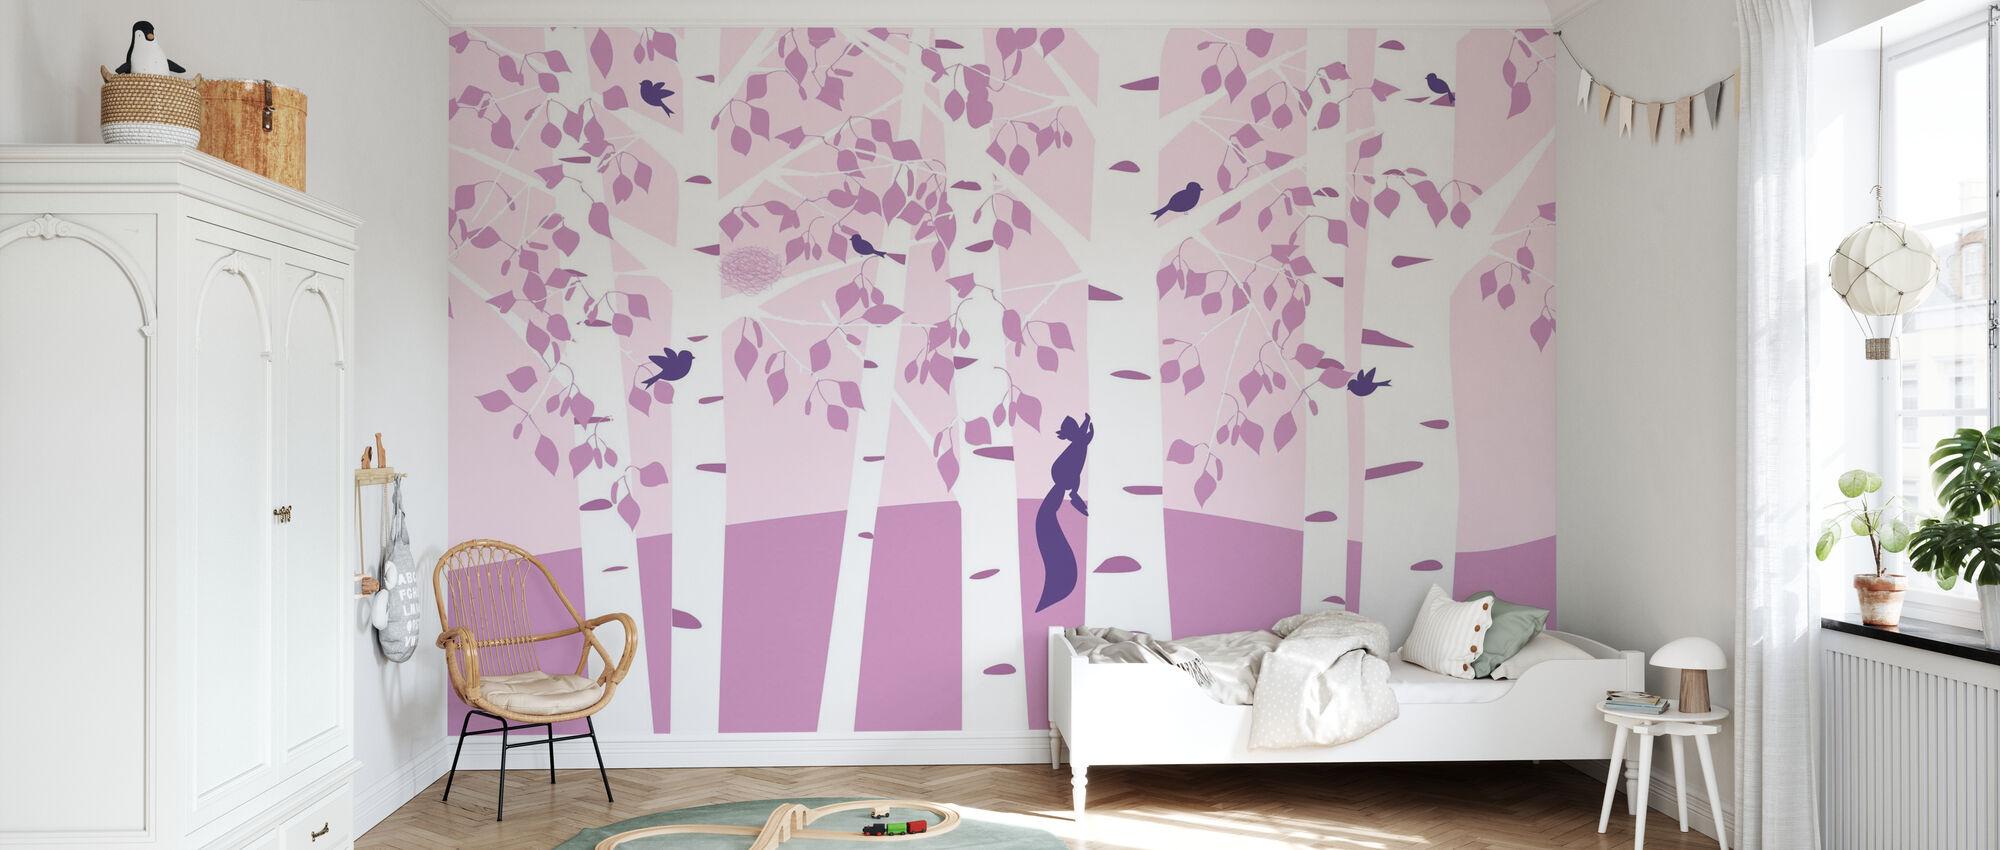 Birch Forest - Pink - Wallpaper - Kids Room